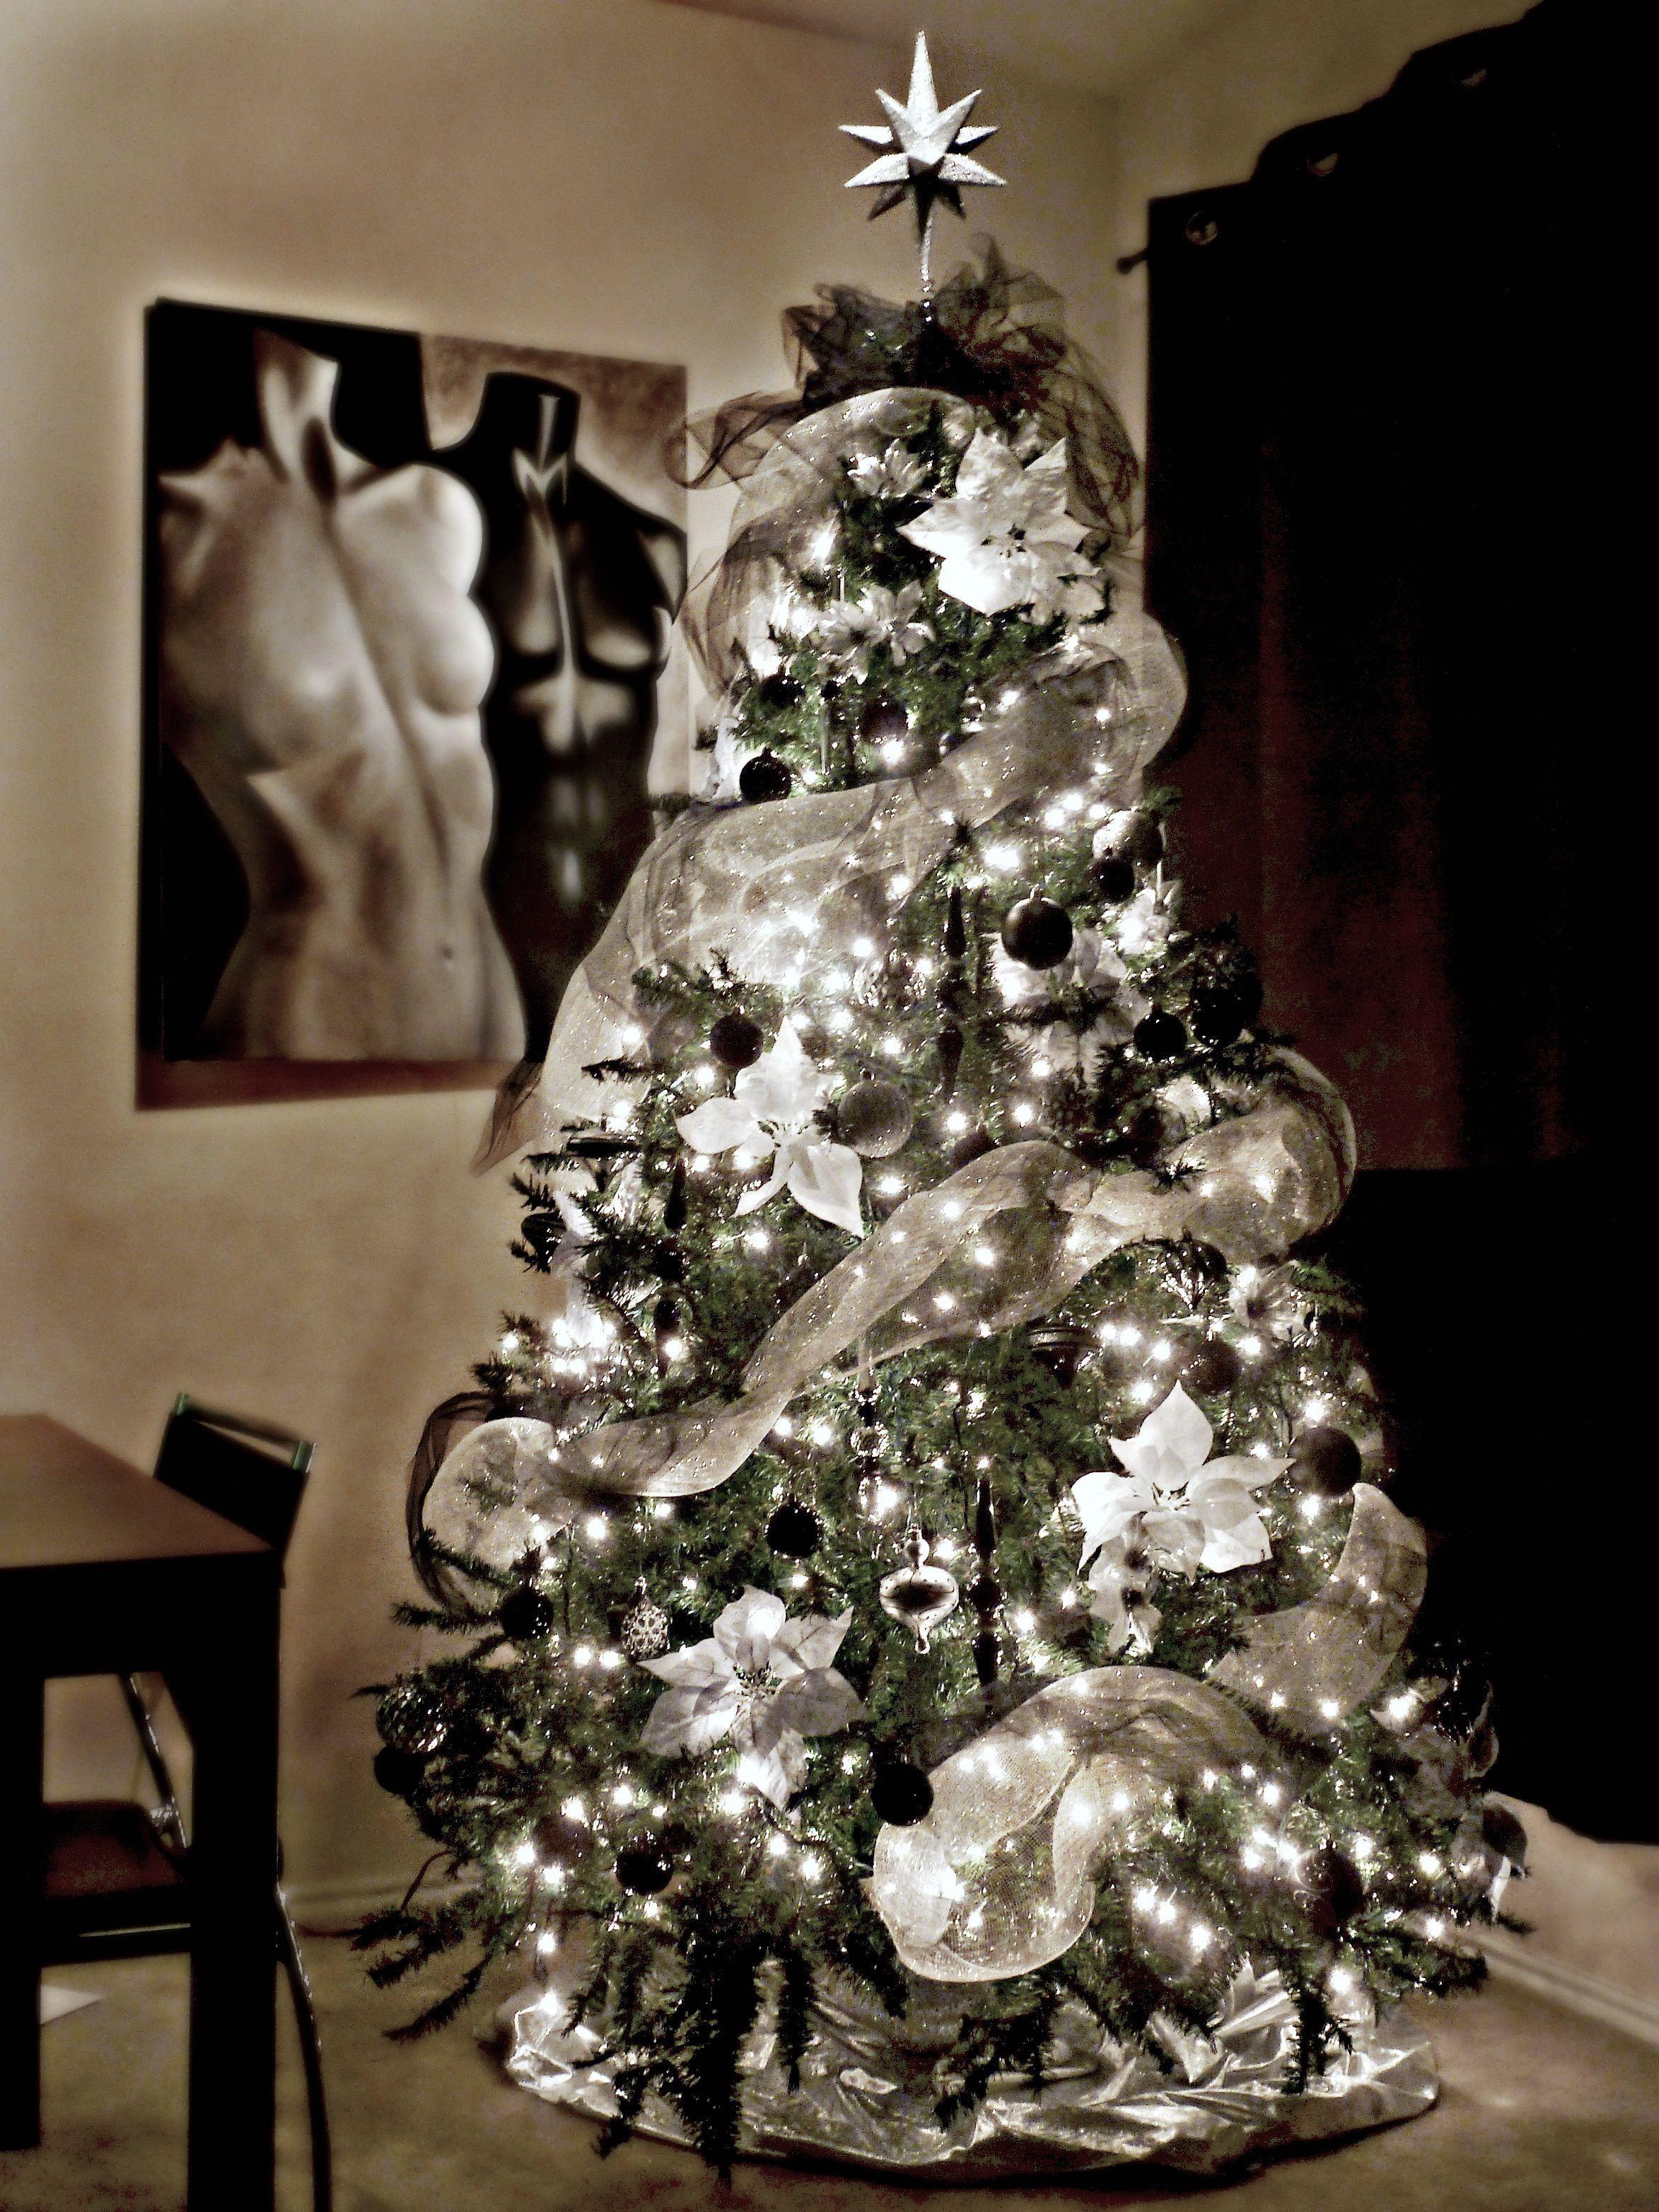 Phenomenal Beautiful Holiday Decor Ideas White Christmas Tree Decorations Decorating With Christmas Lights Silver Christmas Tree